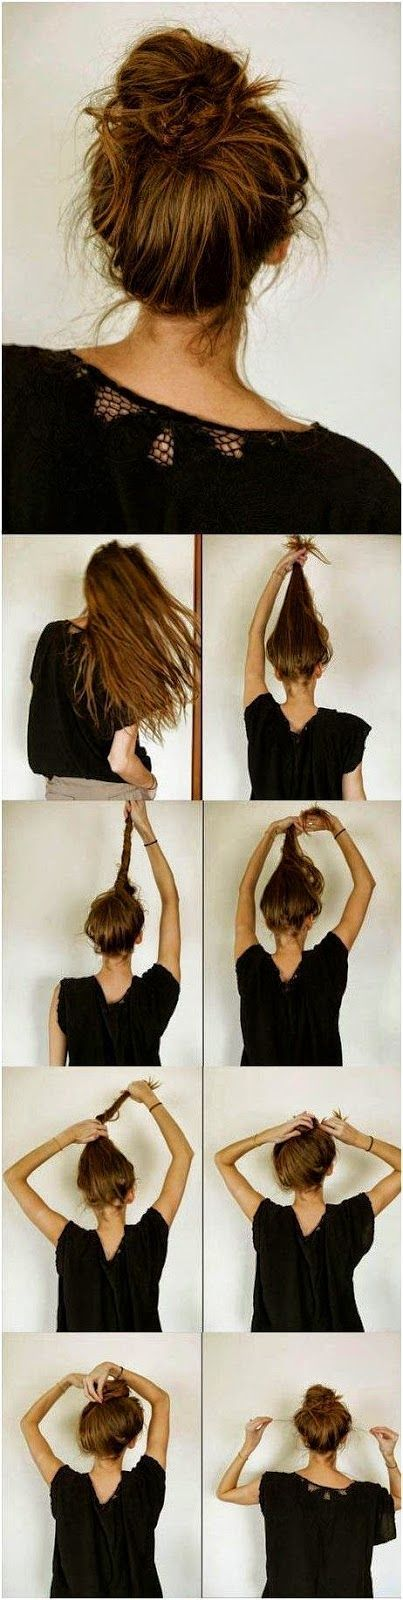 Stupendous 1000 Ideas About Easy Bun Hairstyles On Pinterest Easy Bun Bun Short Hairstyles For Black Women Fulllsitofus